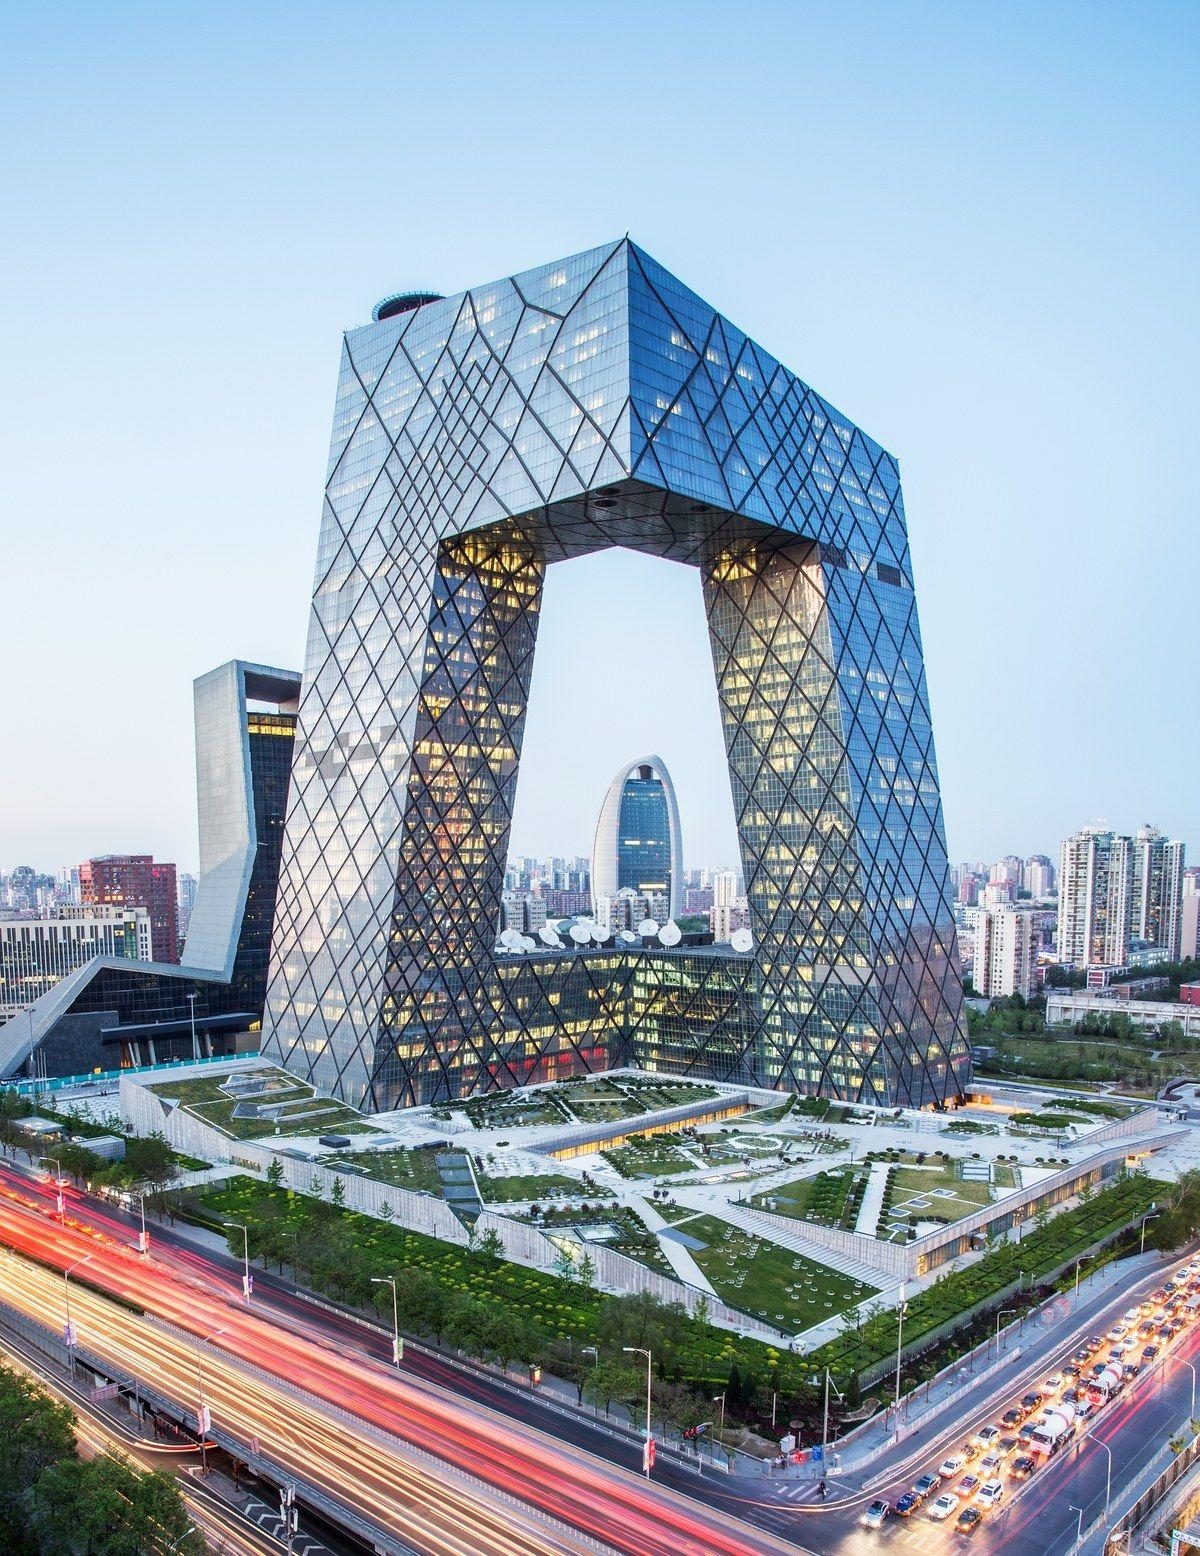 oma rem koolhaas ole scheeren cctv headquarters beijing 2012 architecture pinterest. Black Bedroom Furniture Sets. Home Design Ideas